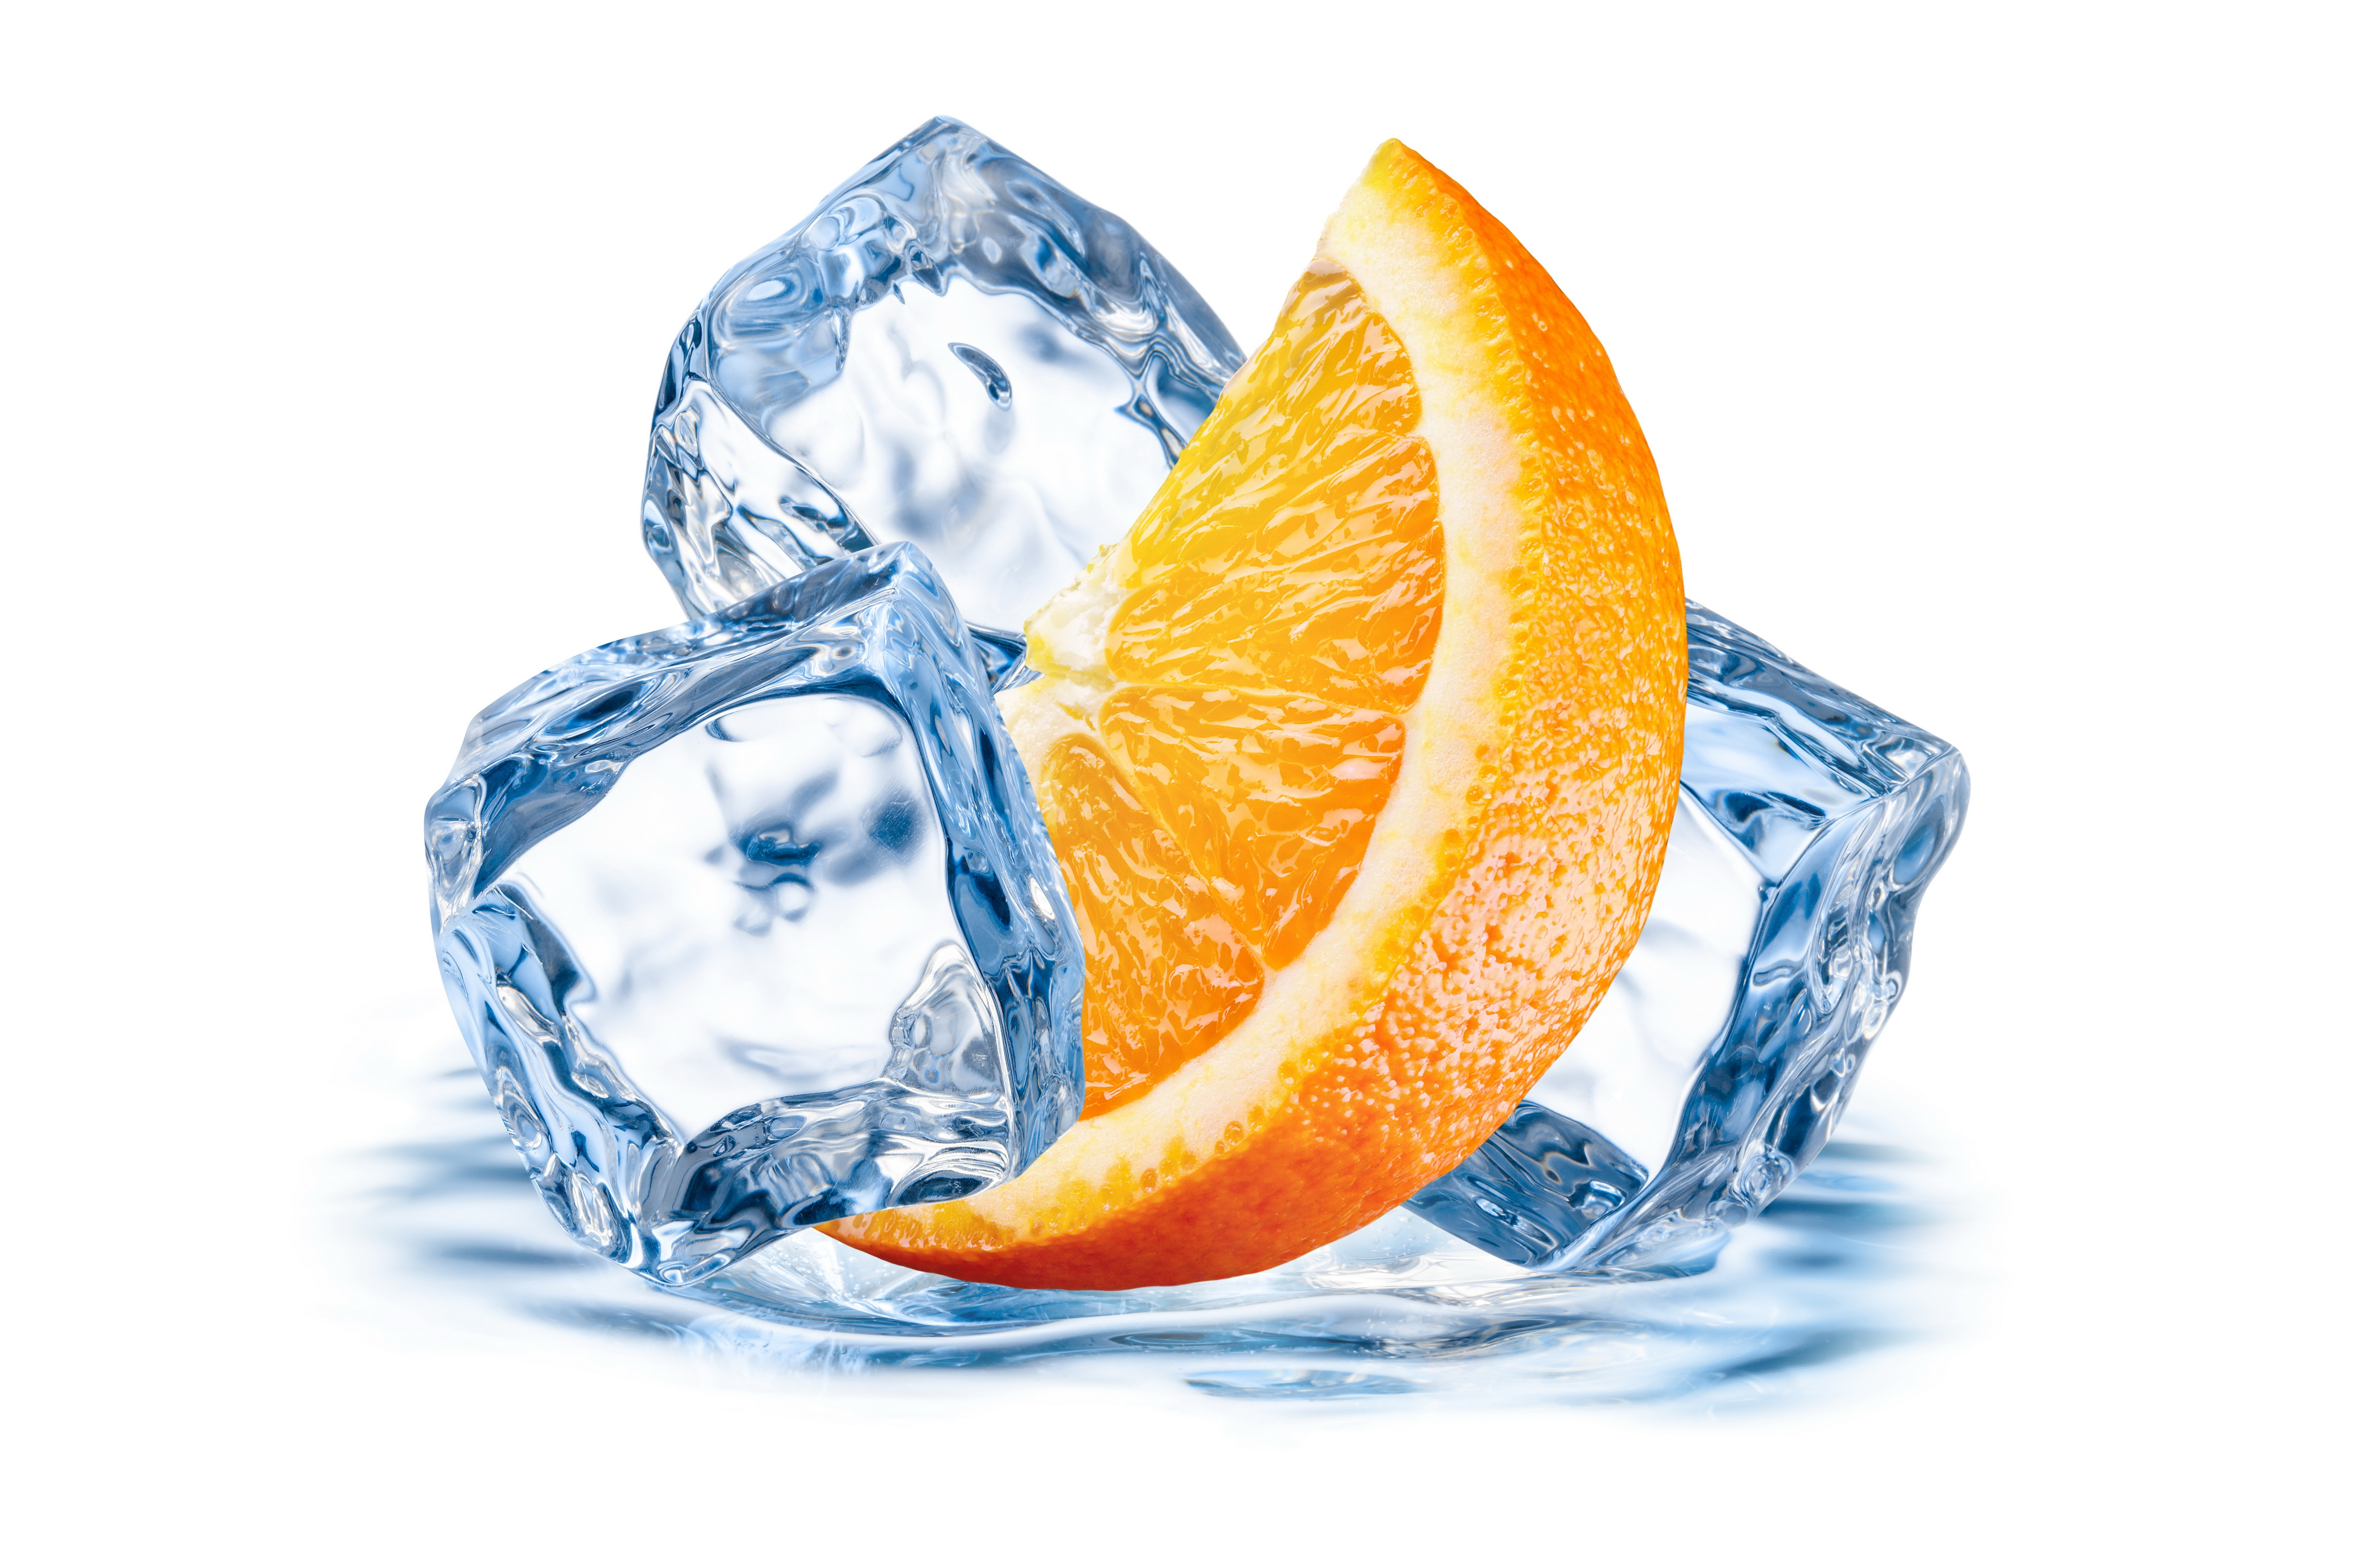 6500x4317 Wallpaper Orange, Ice, Juicy, Citrus Hd, Picture, Image